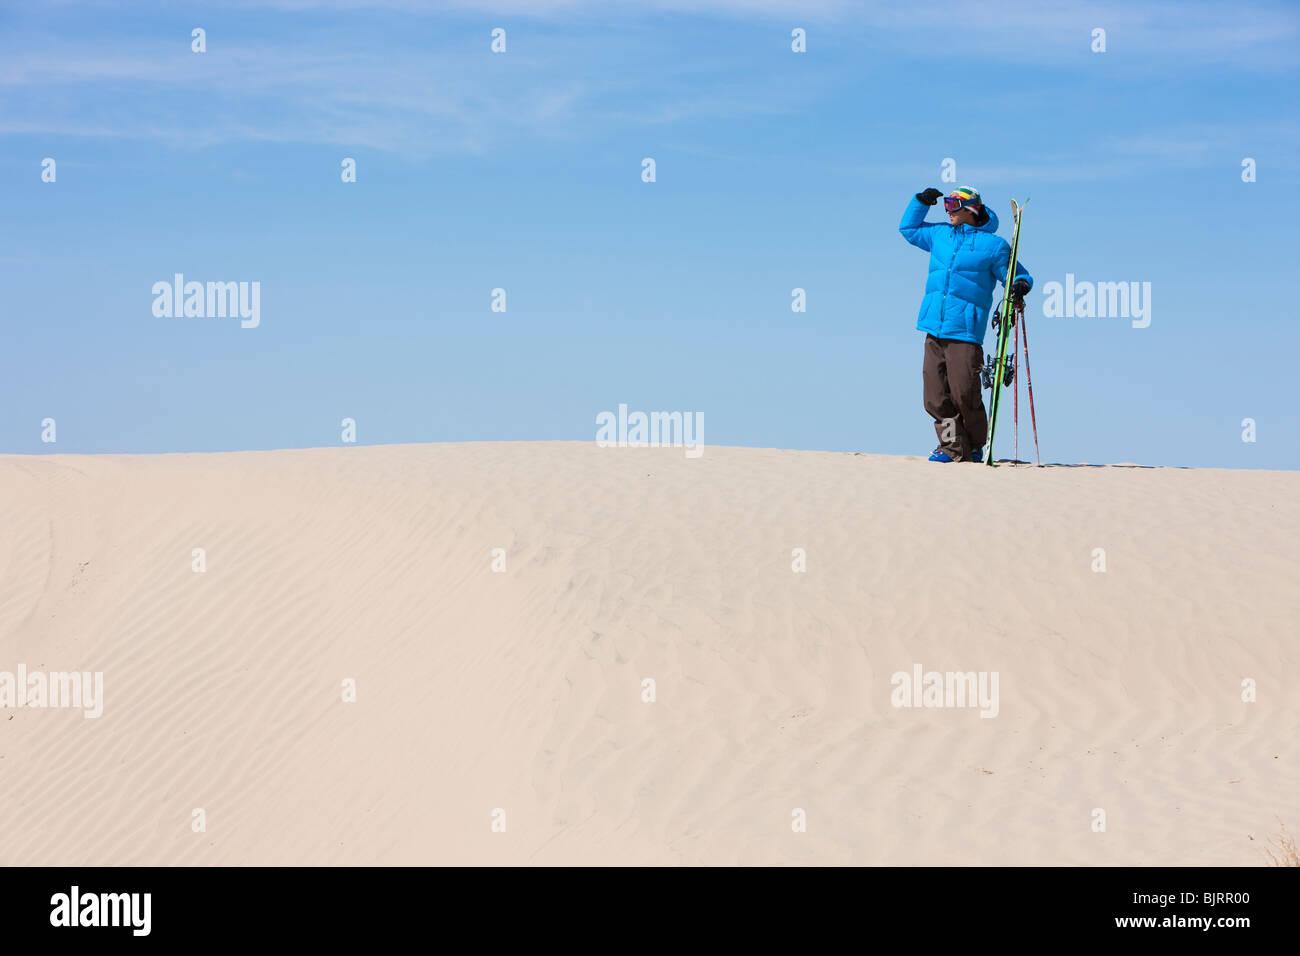 USA, Utah, Little Sahara, man with skiwear in desert - Stock Image